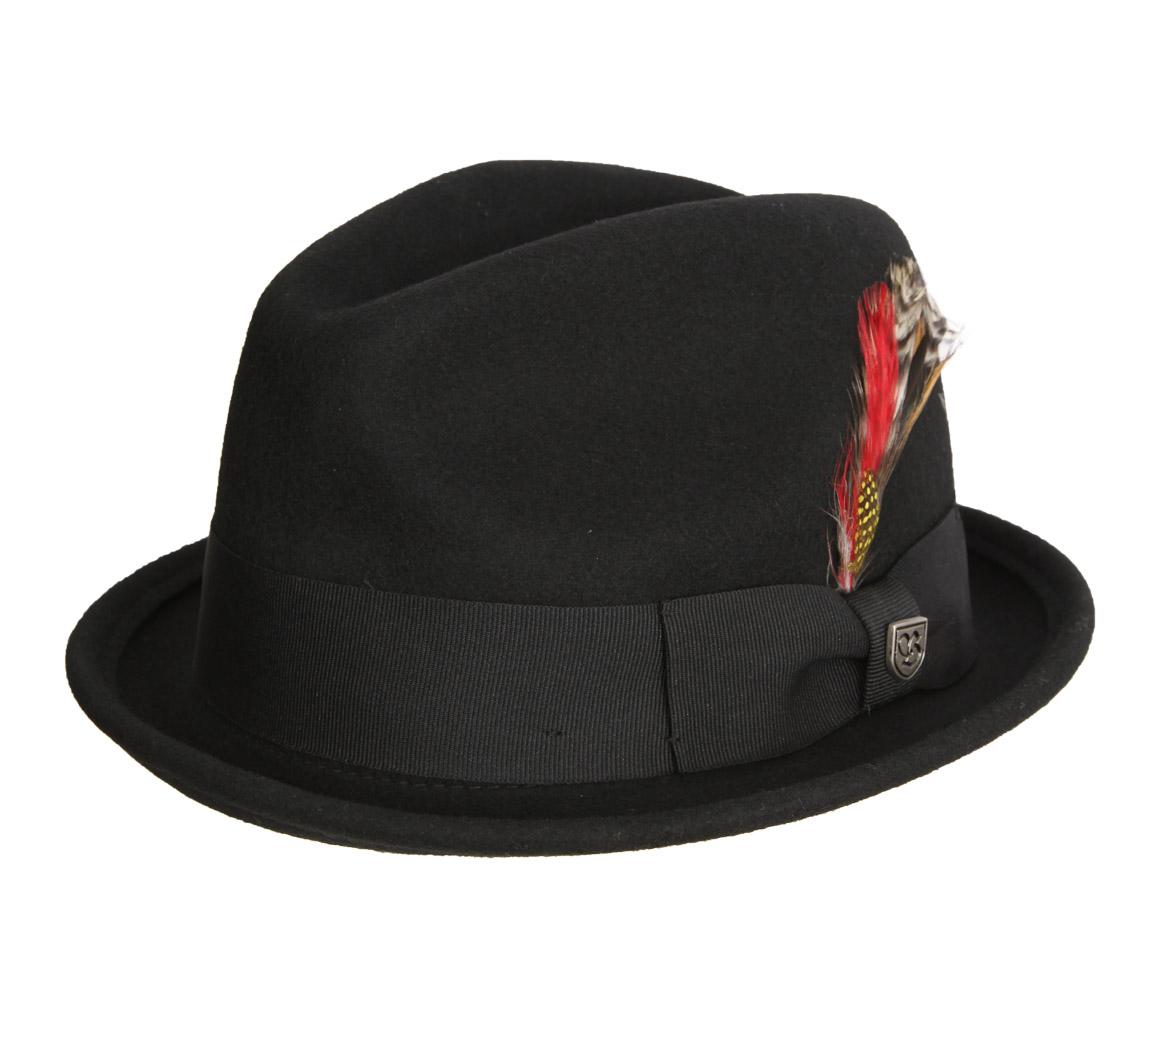 0cf6dc3ac5b0c Chapeau Femme Gain - Sombrero Brixton